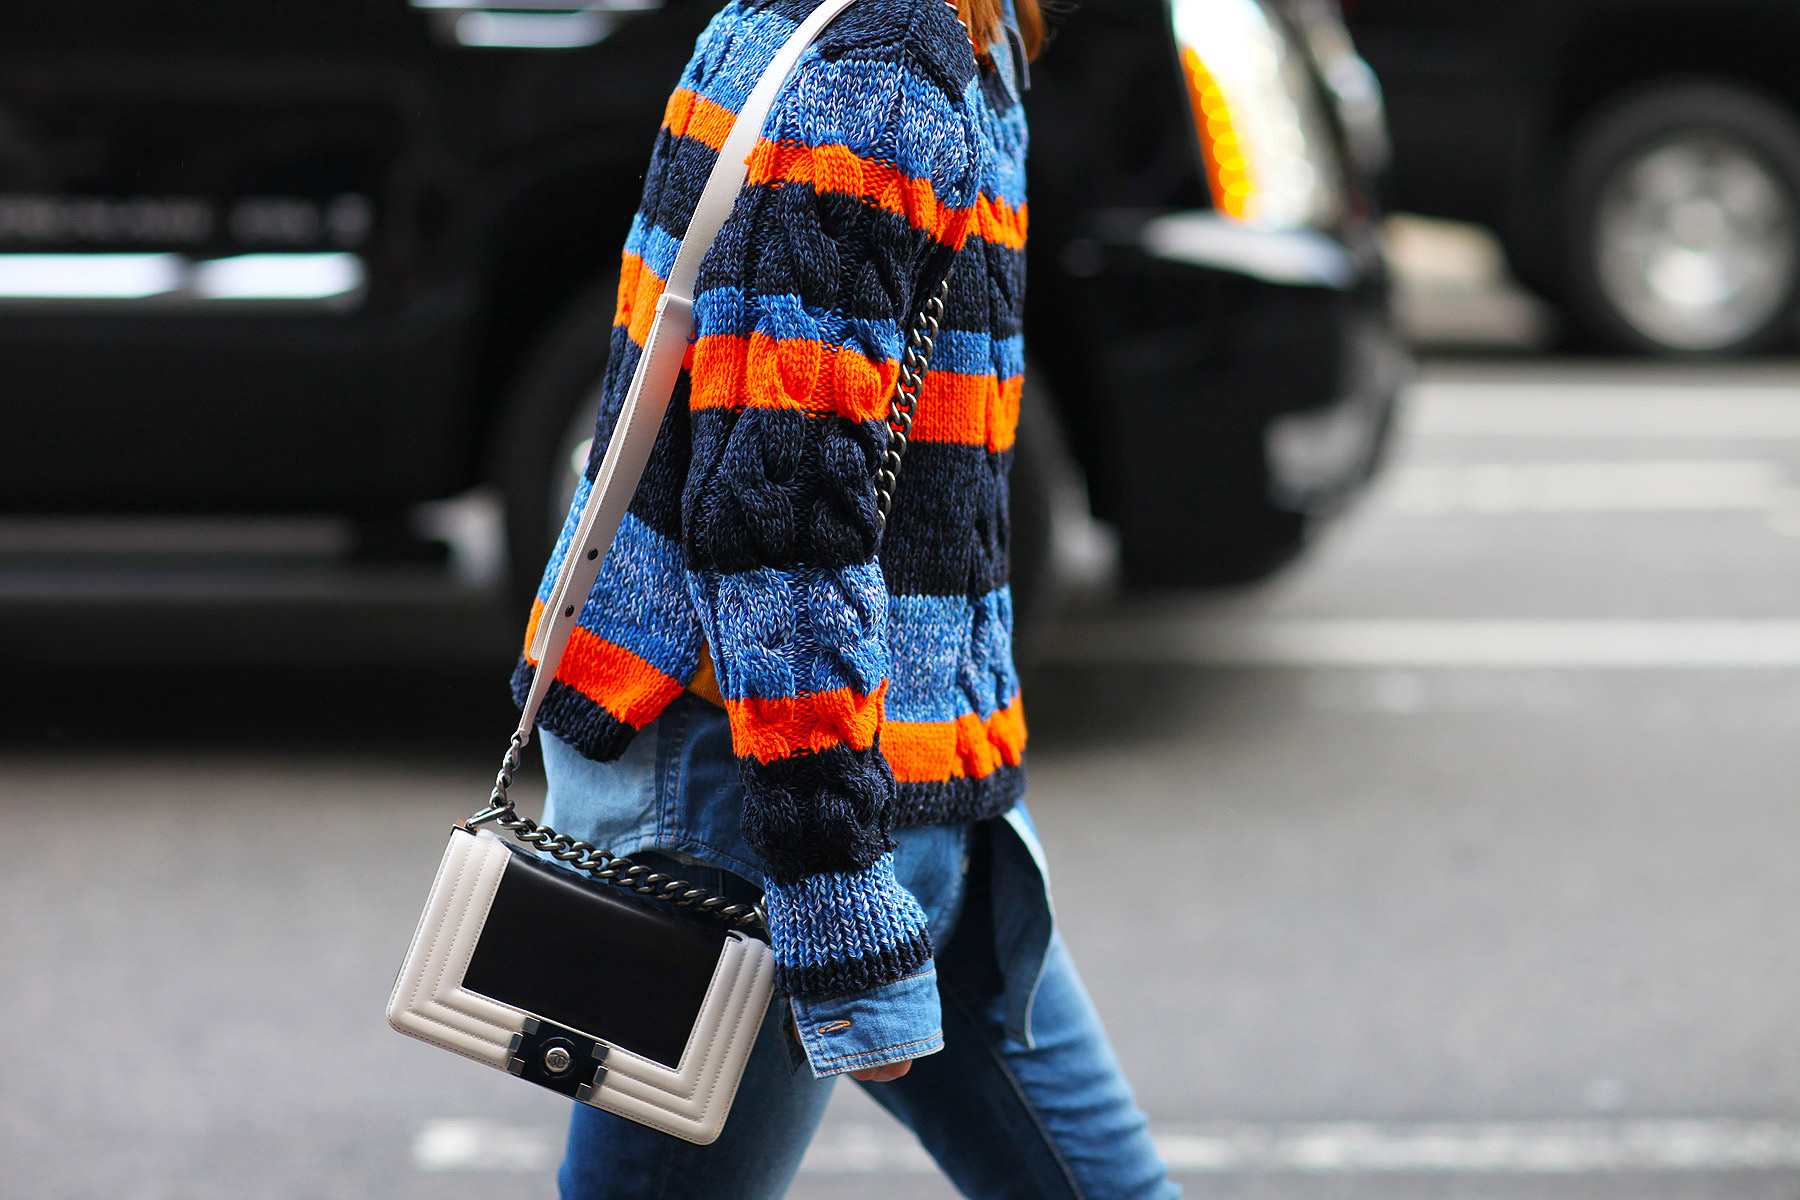 Tommy Hilfiger Sweater, Chanel Bag